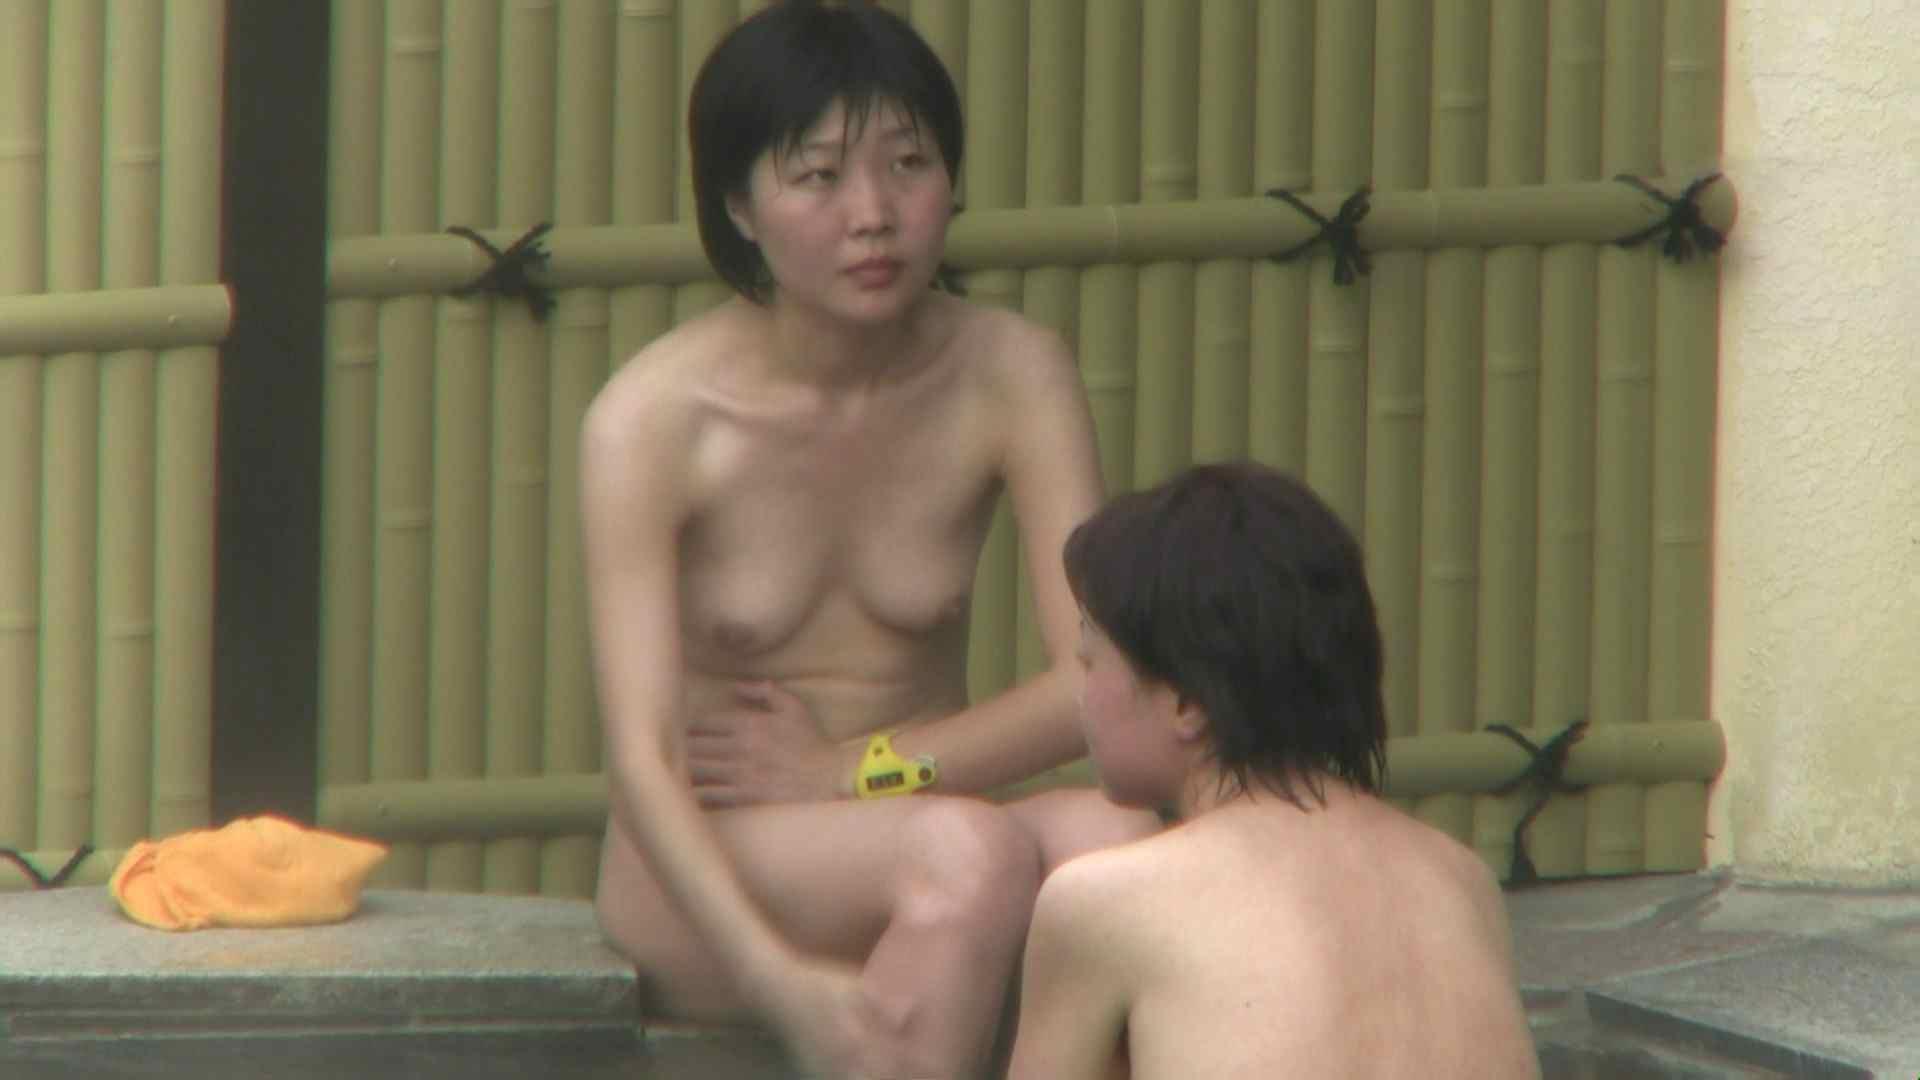 Aquaな露天風呂Vol.74【VIP限定】 露天風呂編 | 盗撮シリーズ  103PIX 101